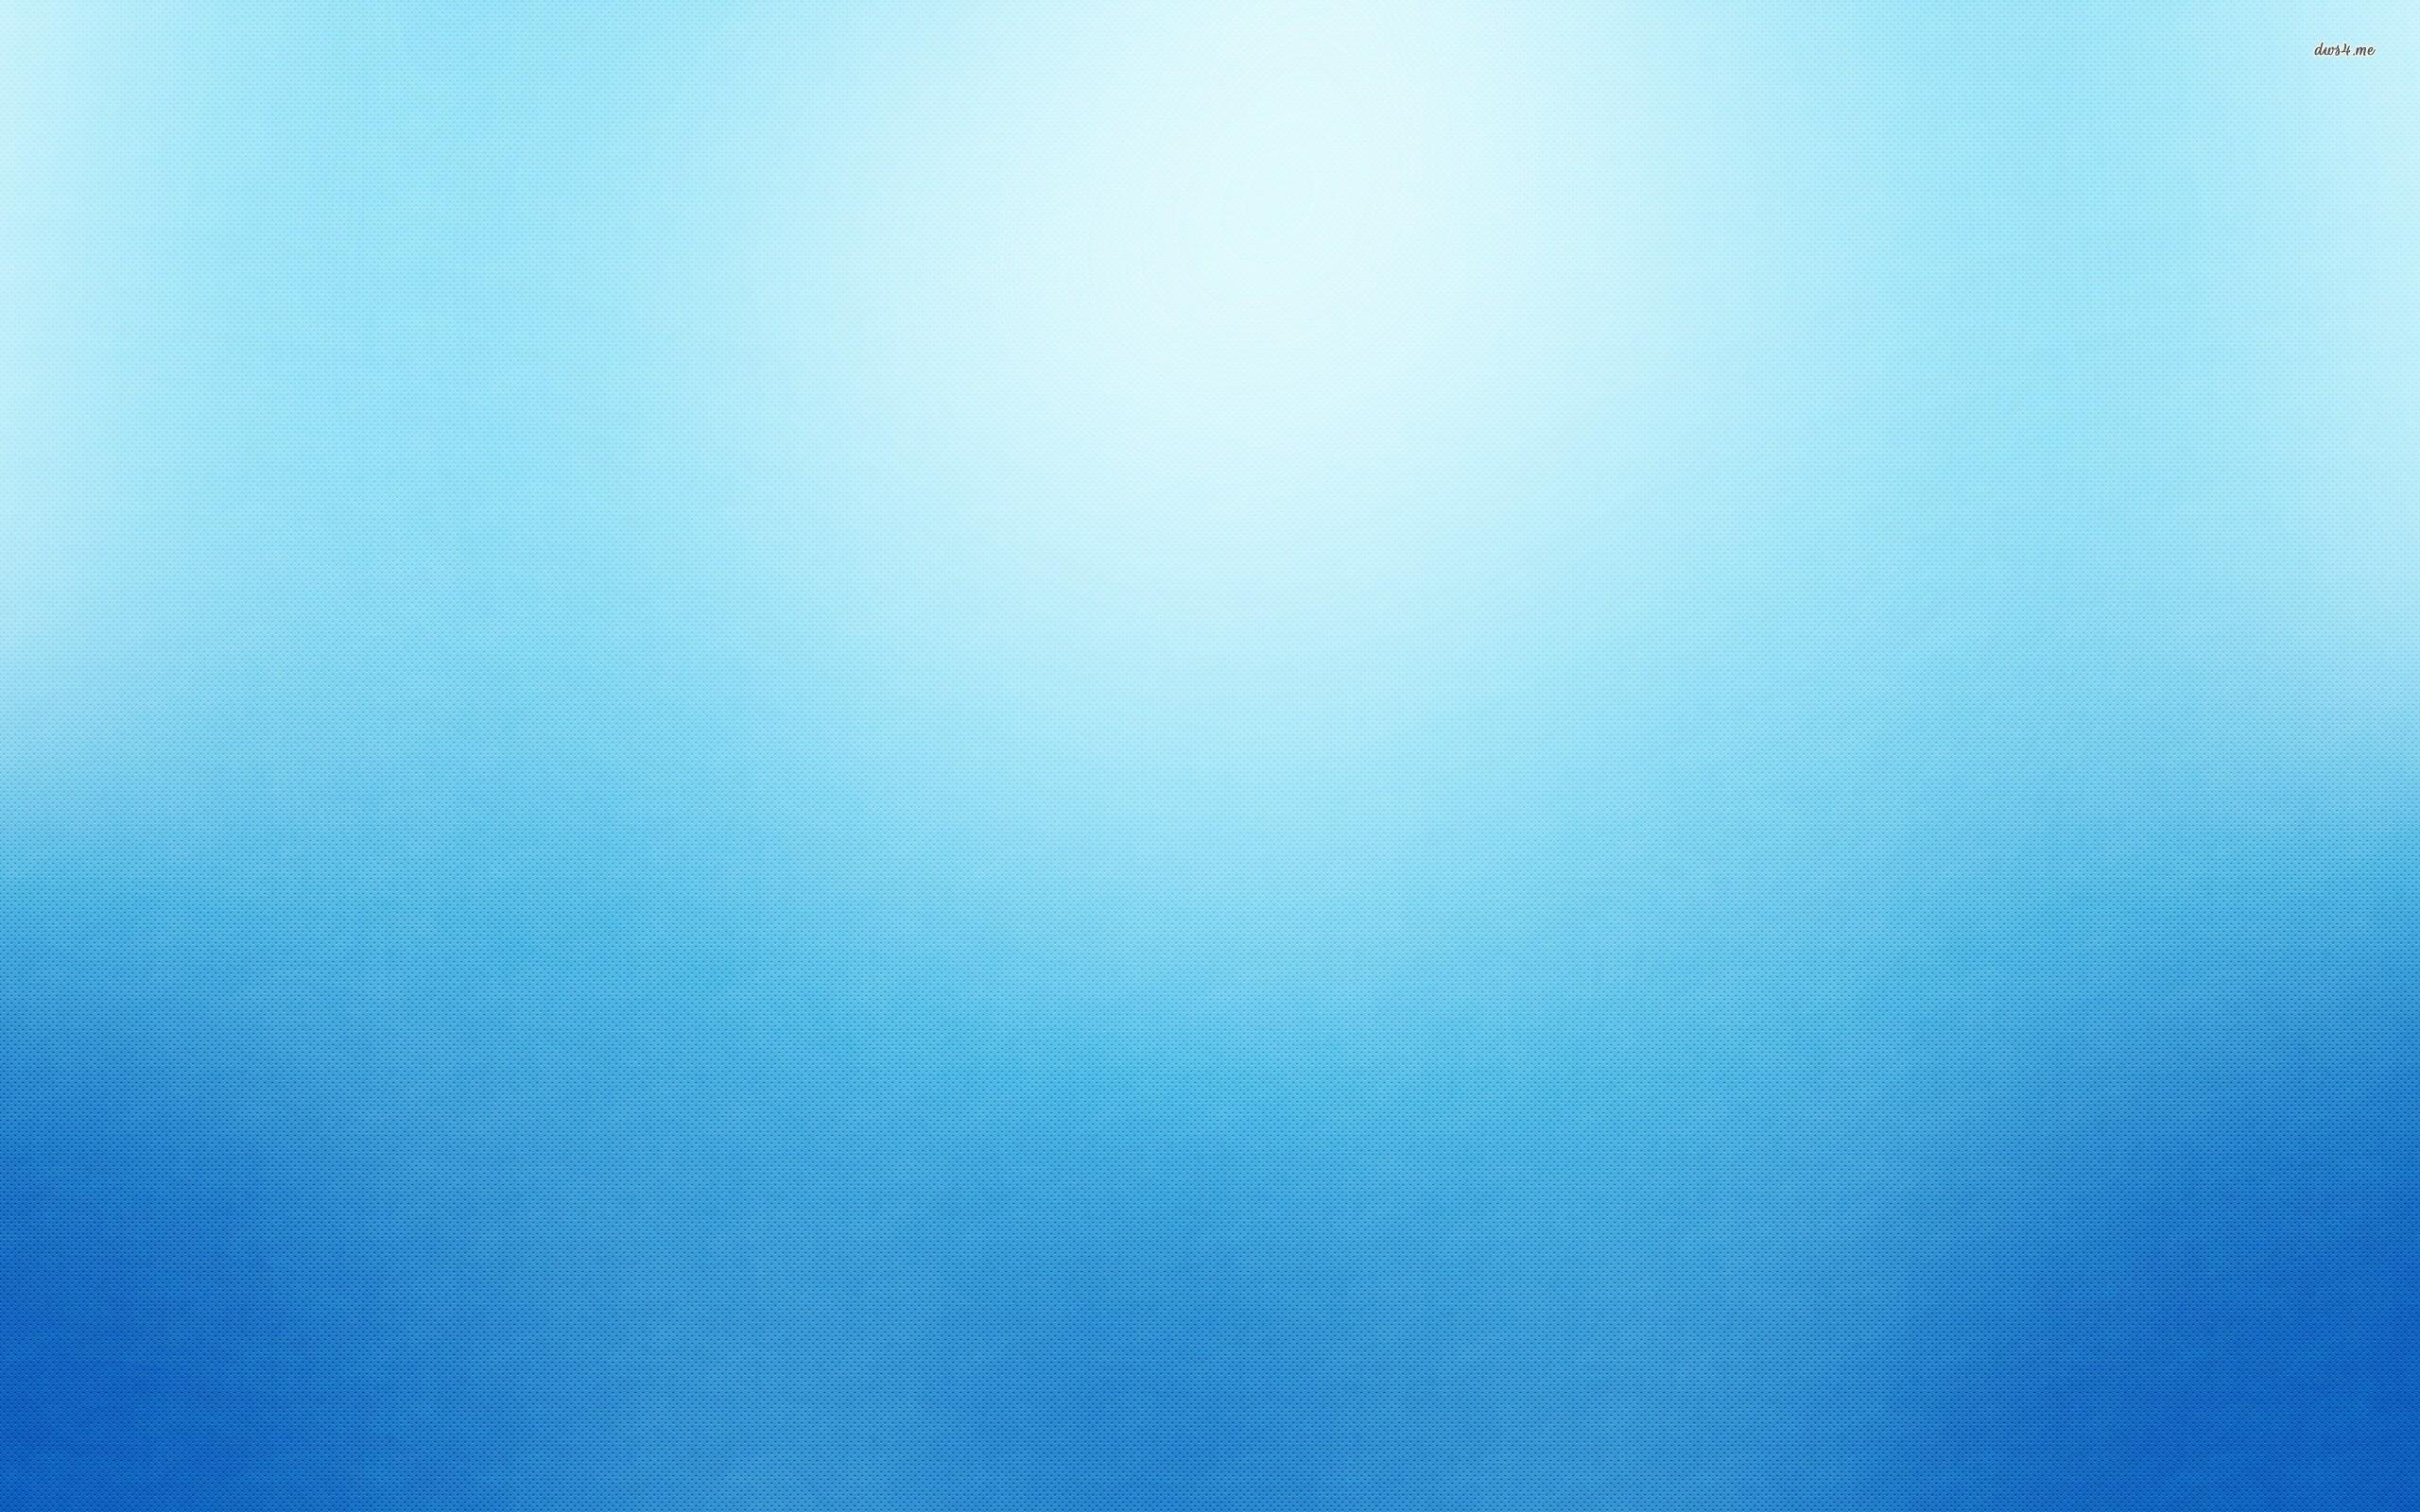 Light Blue Texture Wallpaper (51+ images)